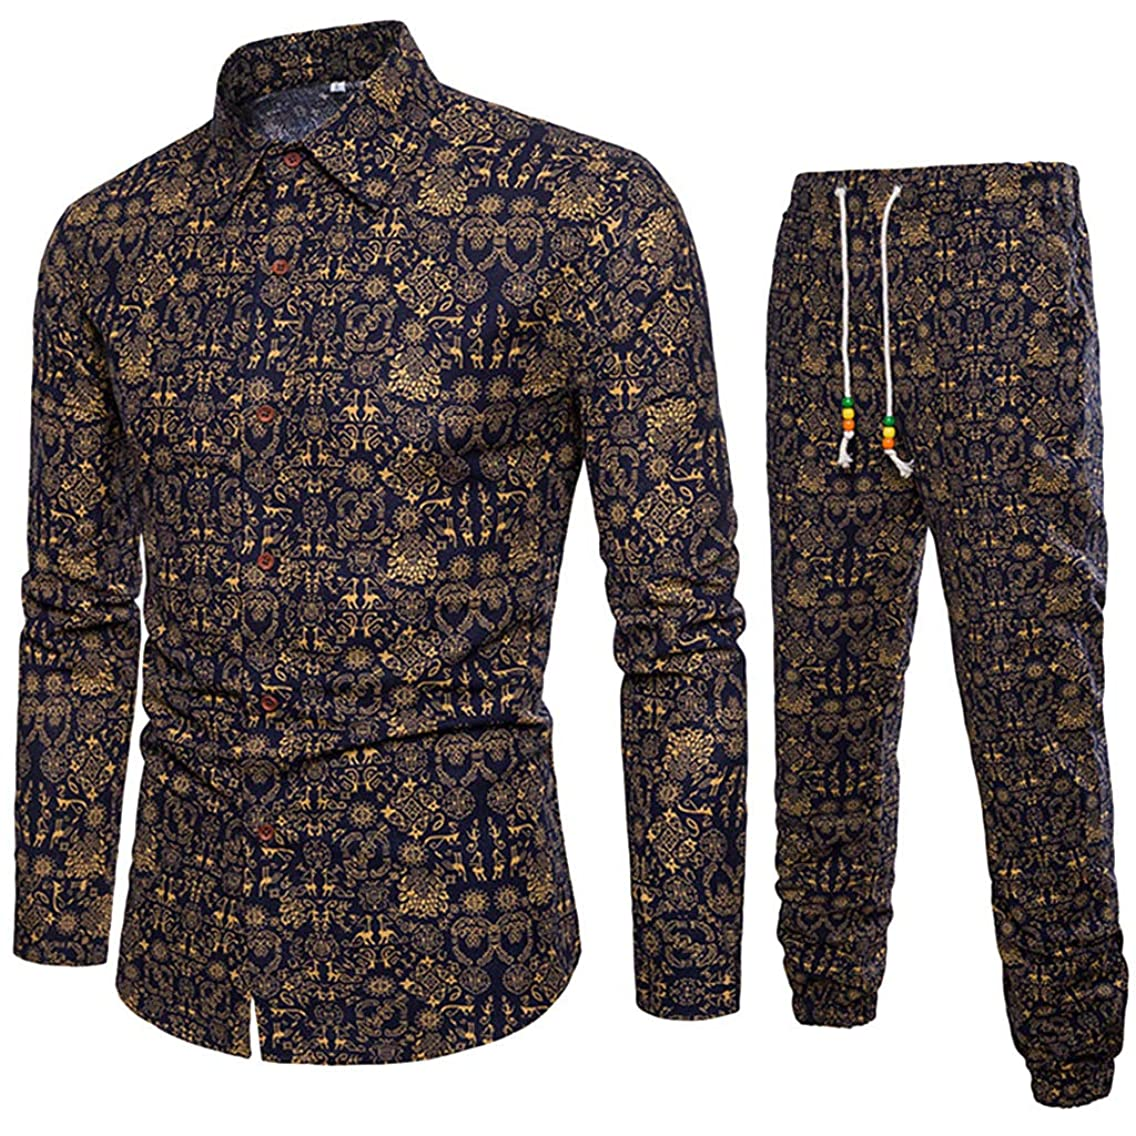 AmyDong Men's Casual Long Sleeve Business Slim Fit Shirt Ethnic Style Printed Blouse Top+Pants Cotton Linen Jacket Pants Suit